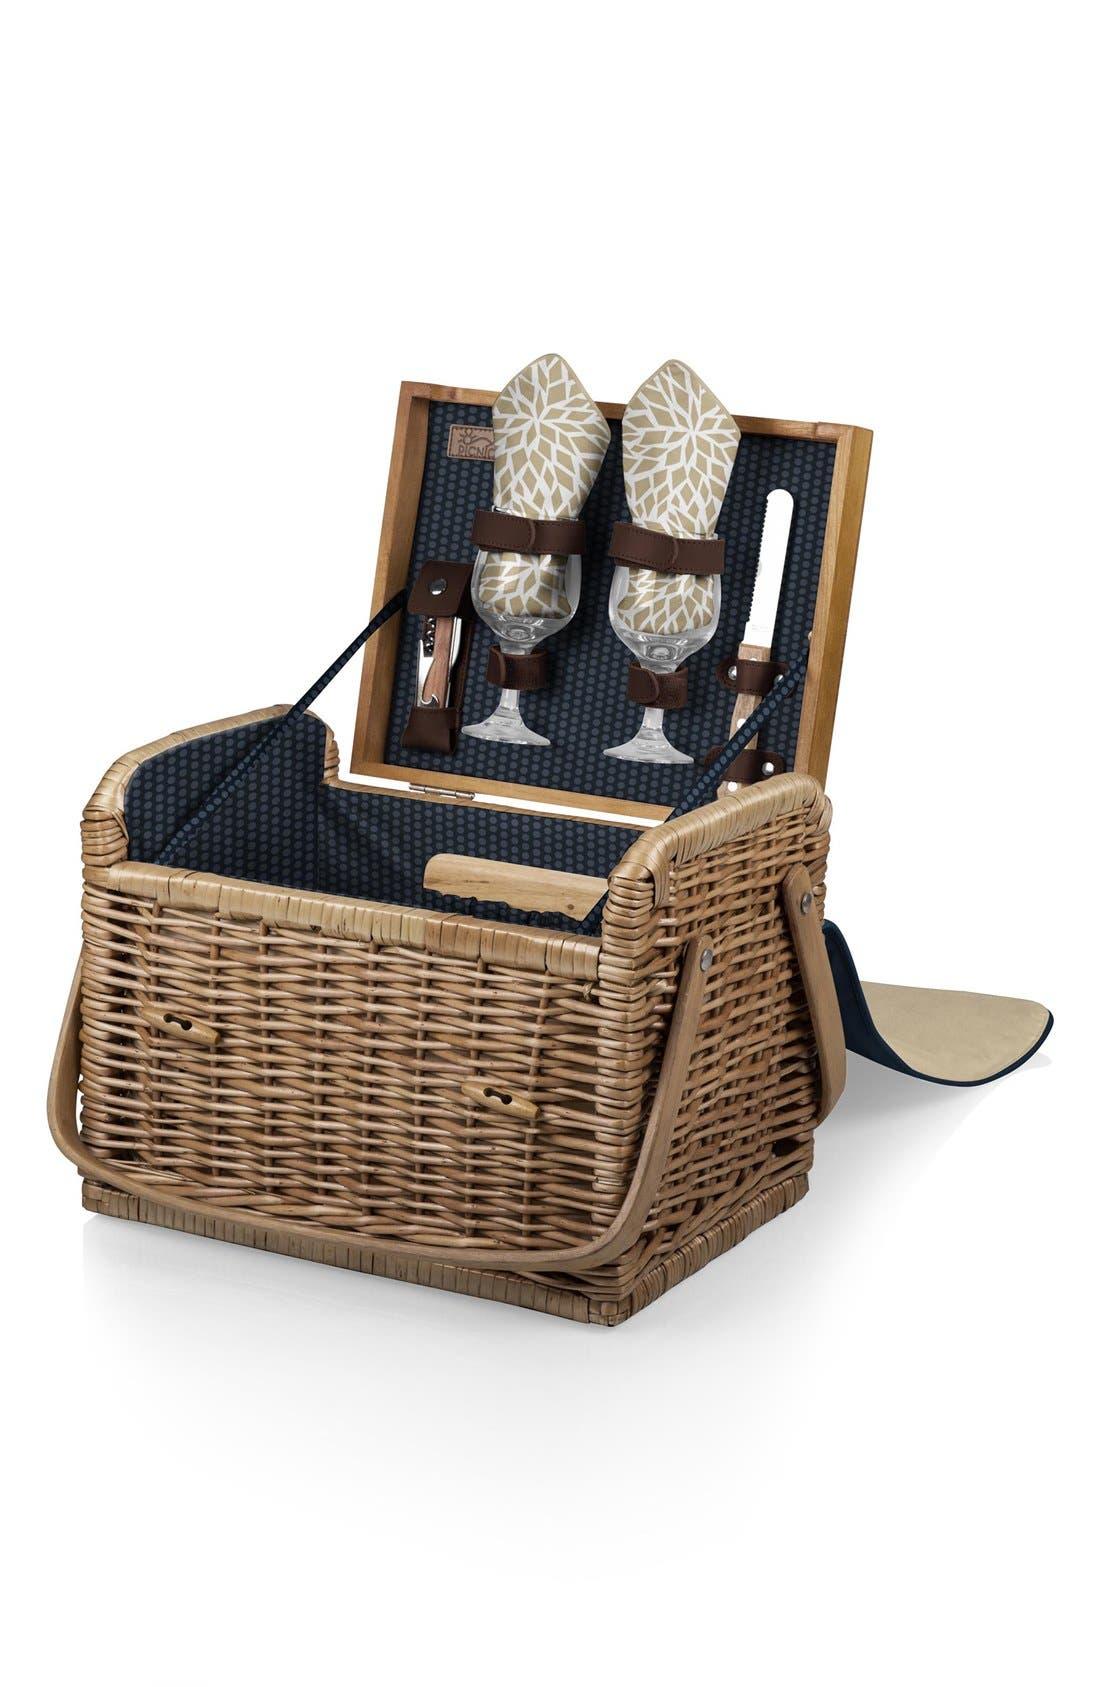 PicnicTime 'Kabrio' Wine & Cheese Picnic Basket